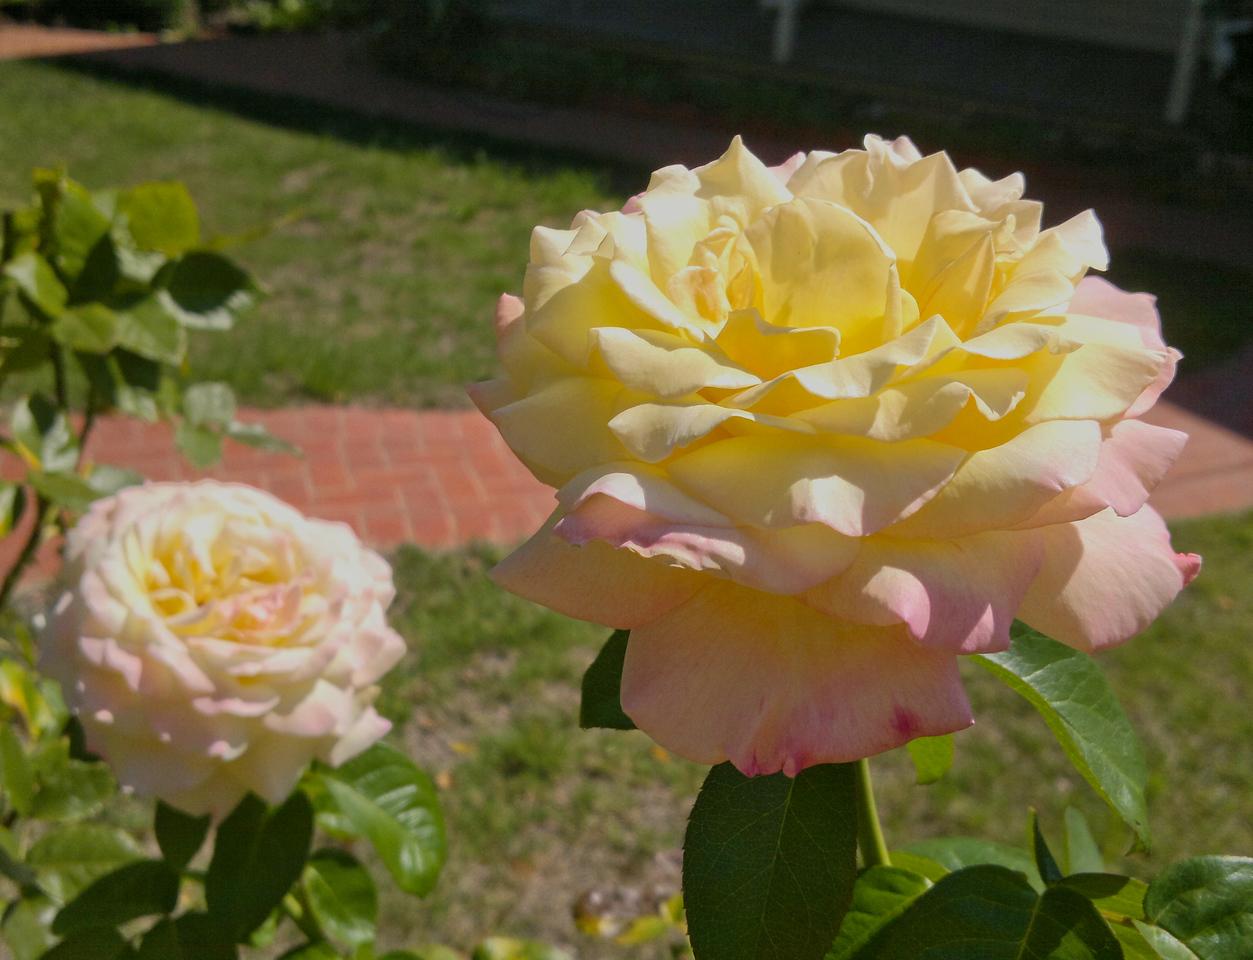 20130309_1153_041 roses